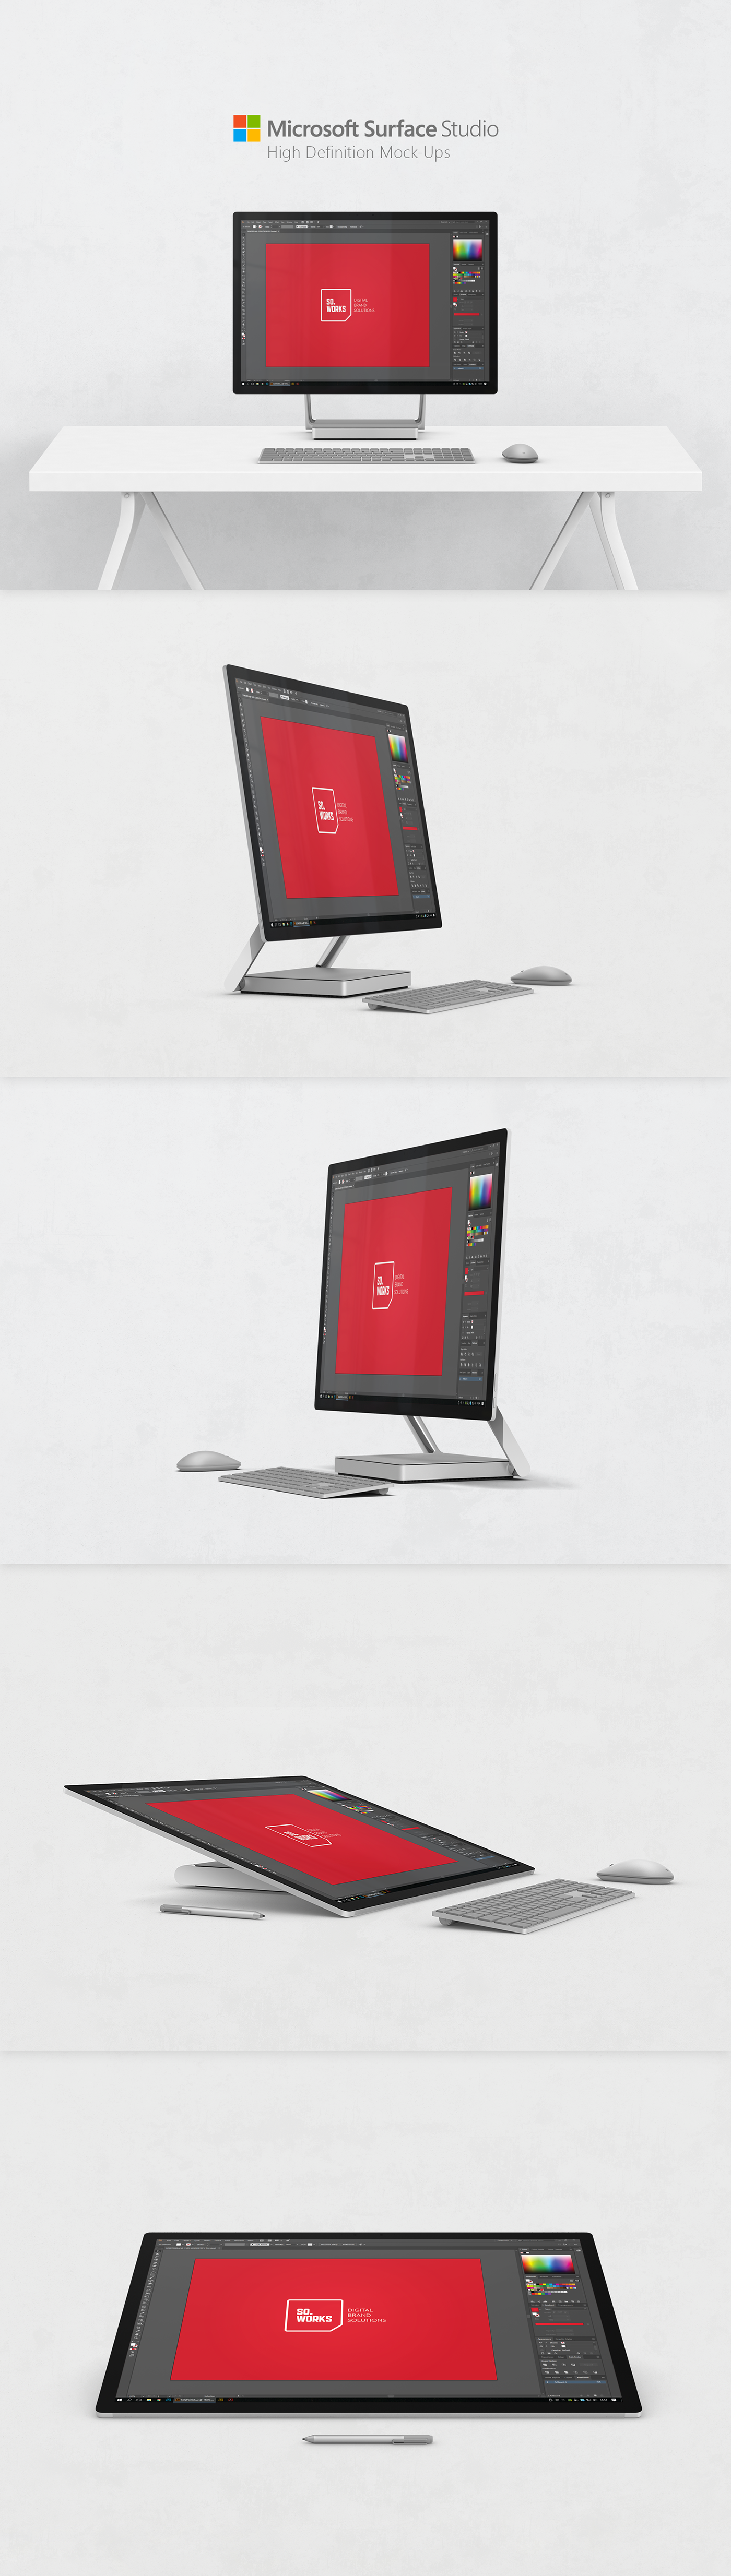 surface Surface Studio Microsoft PC Mockup mock-up free desktop Computer screen